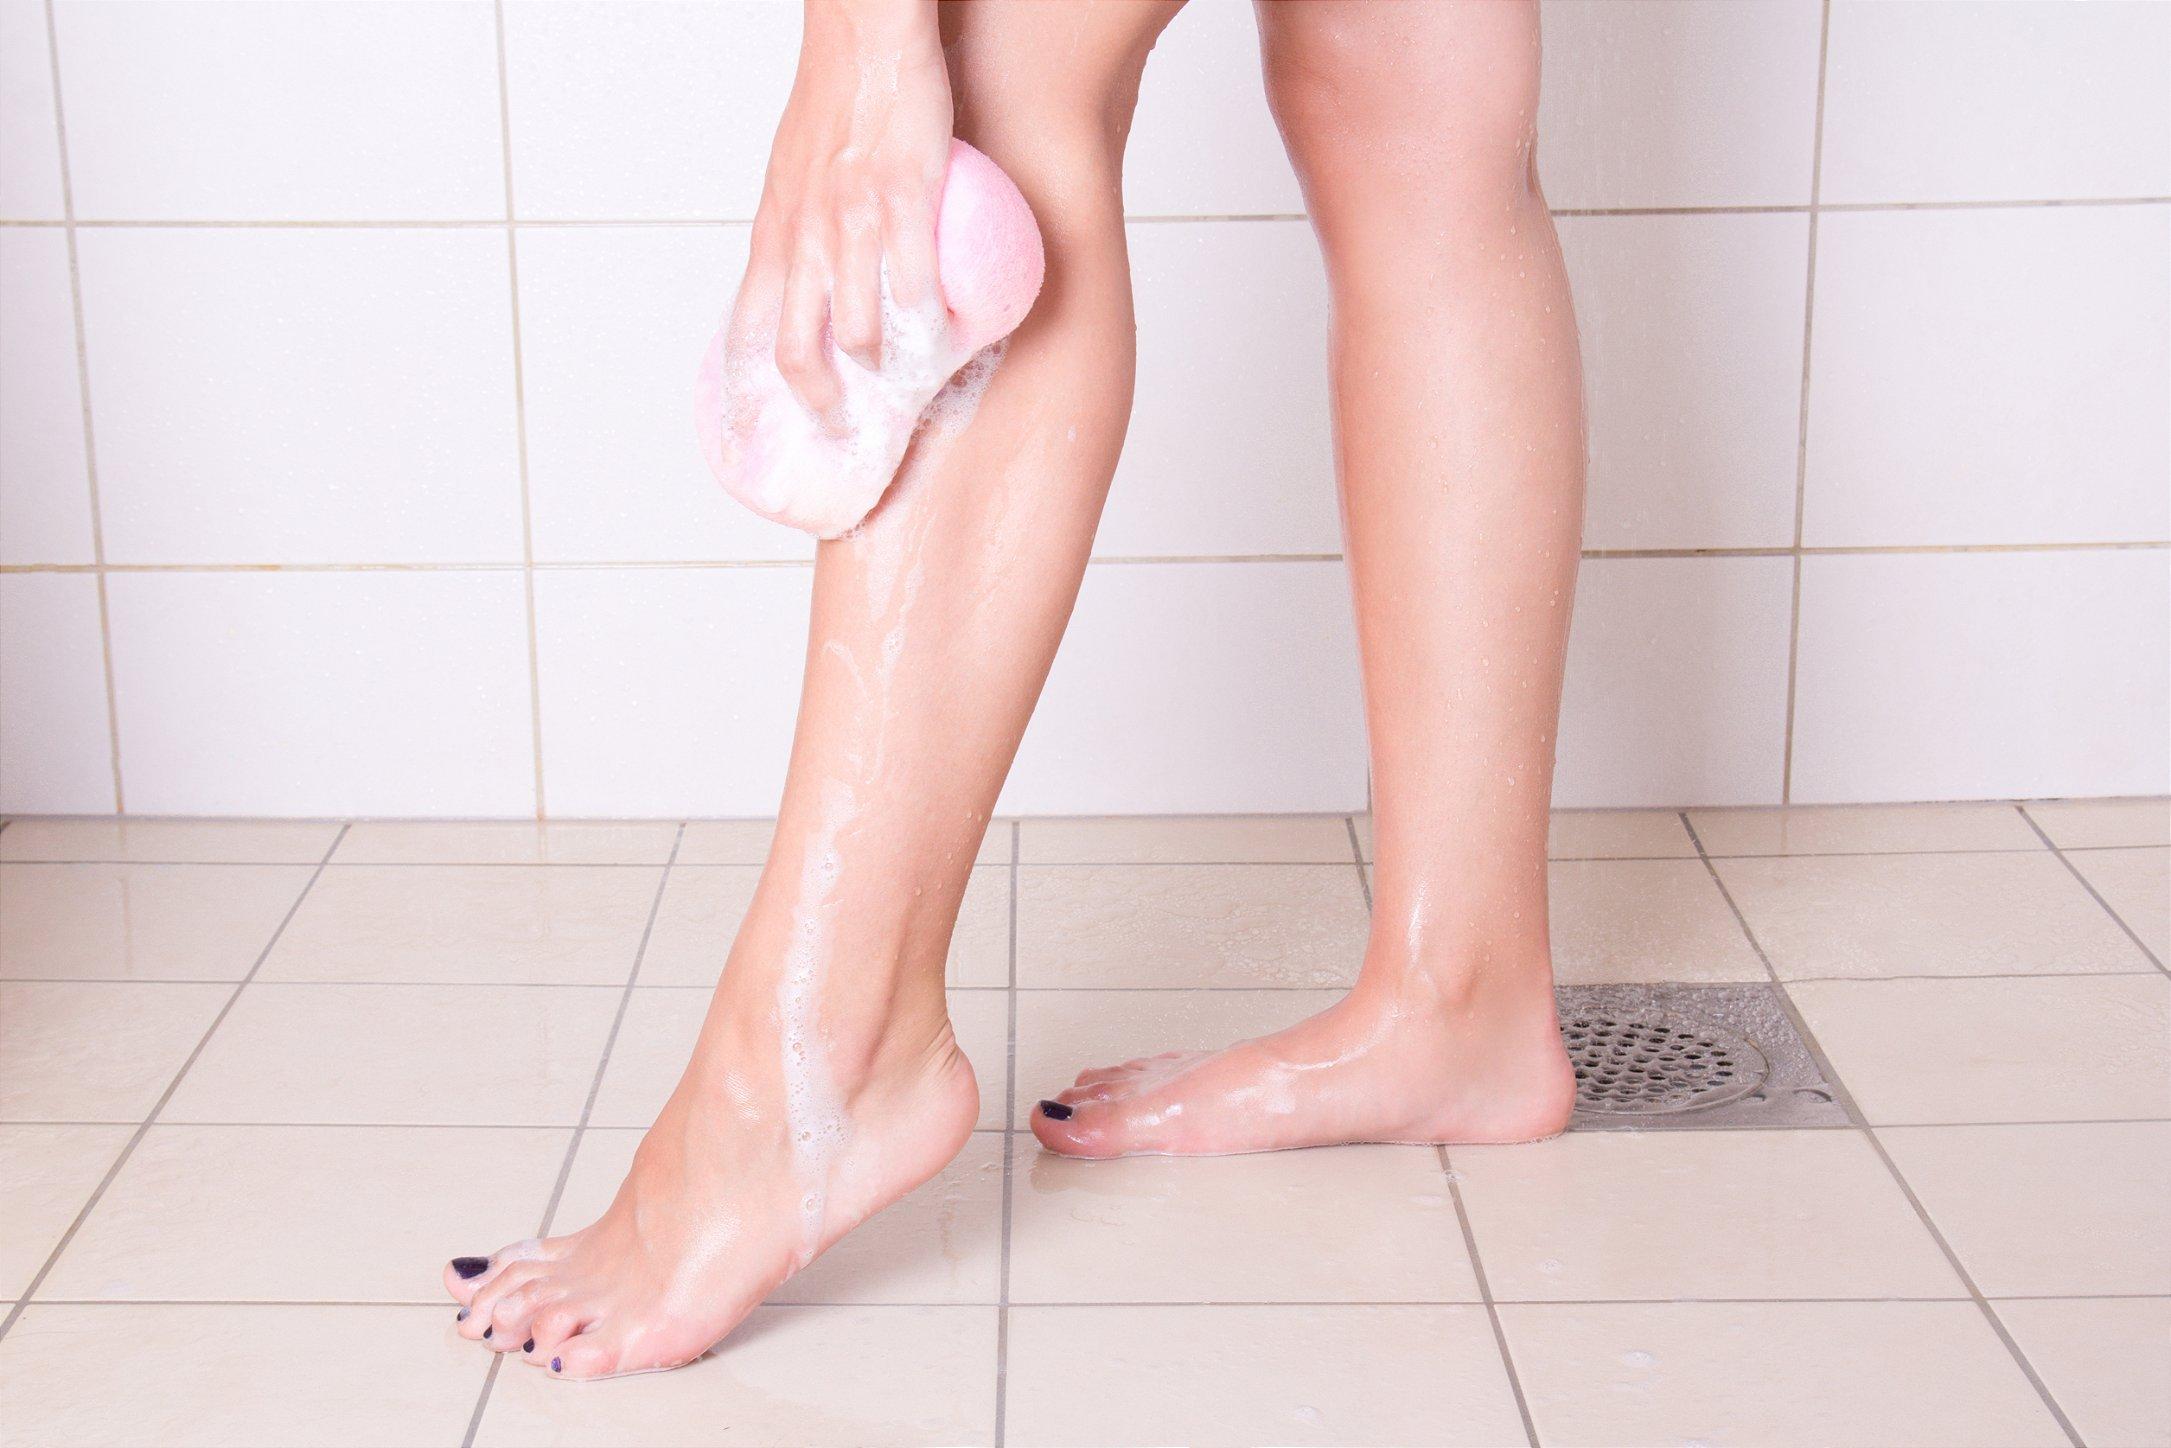 mulher lavando perna